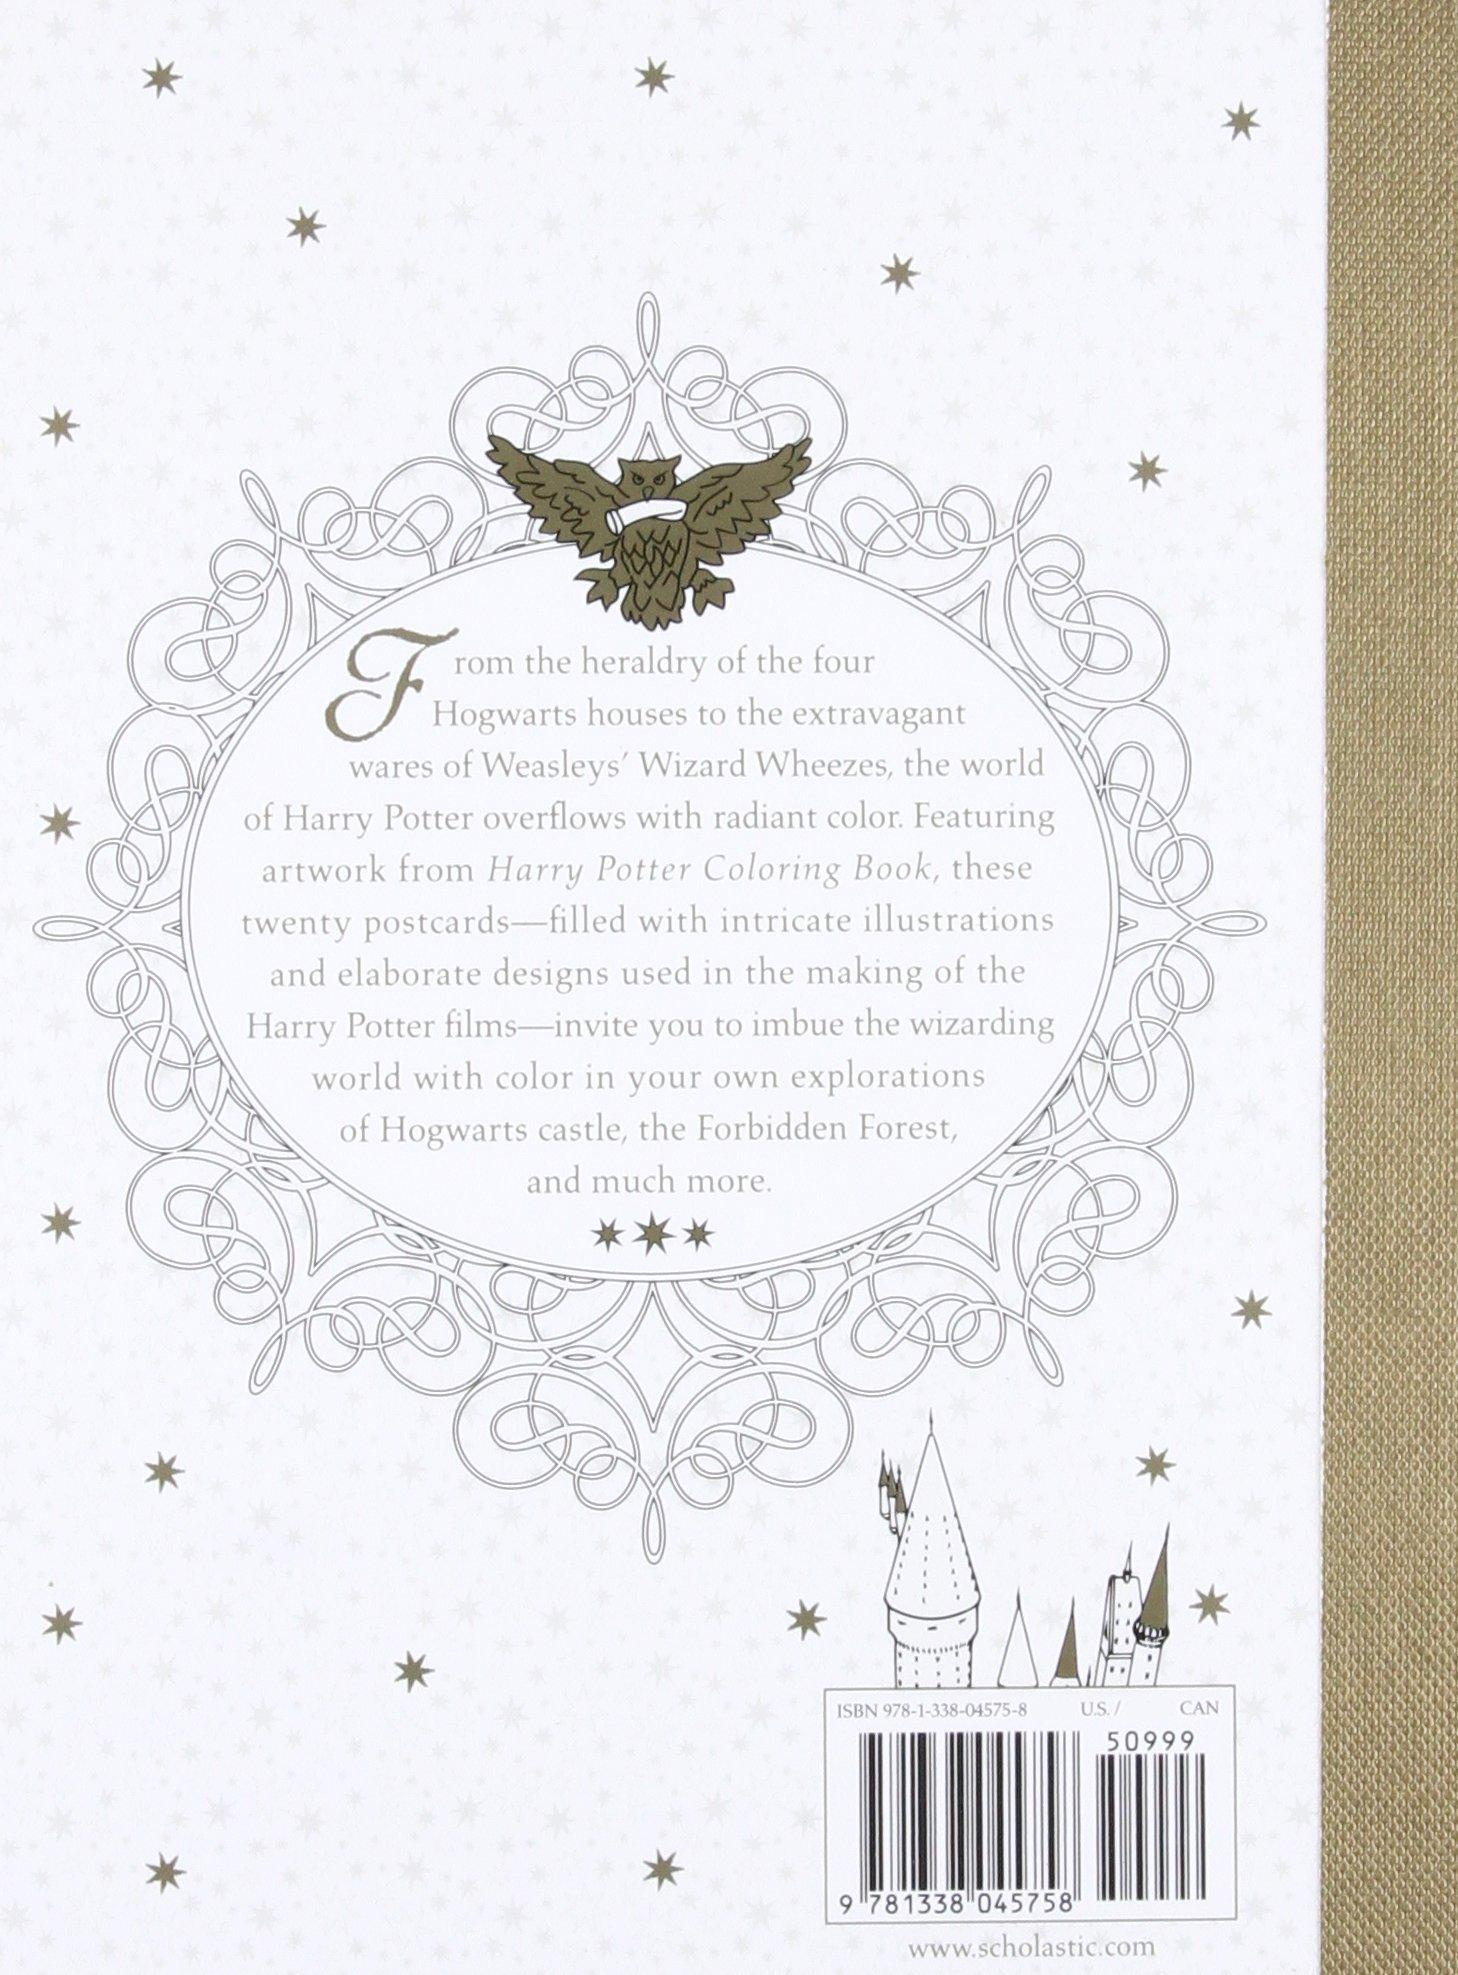 Harry Potter Postcard Coloring Book Scholastic 9781338045758